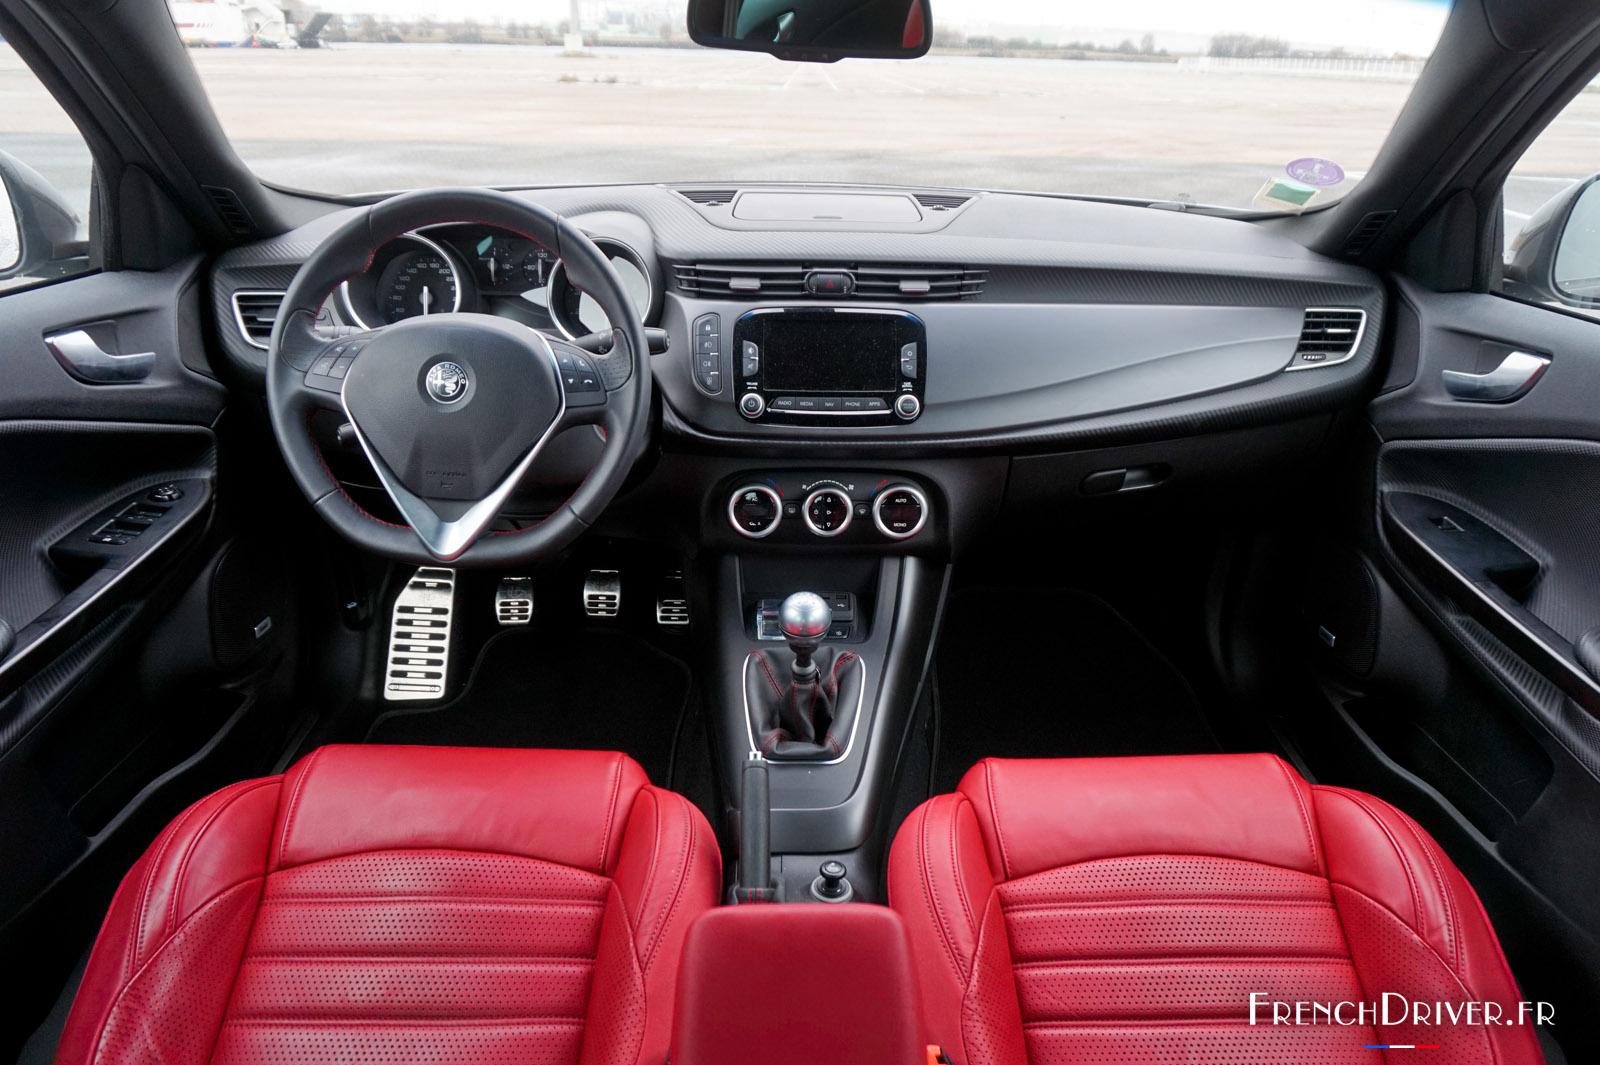 2018 Alfa Romeo Giulietta >> Essai Alfa Romeo Giulietta Lusso : un air d'Italie - French Driver